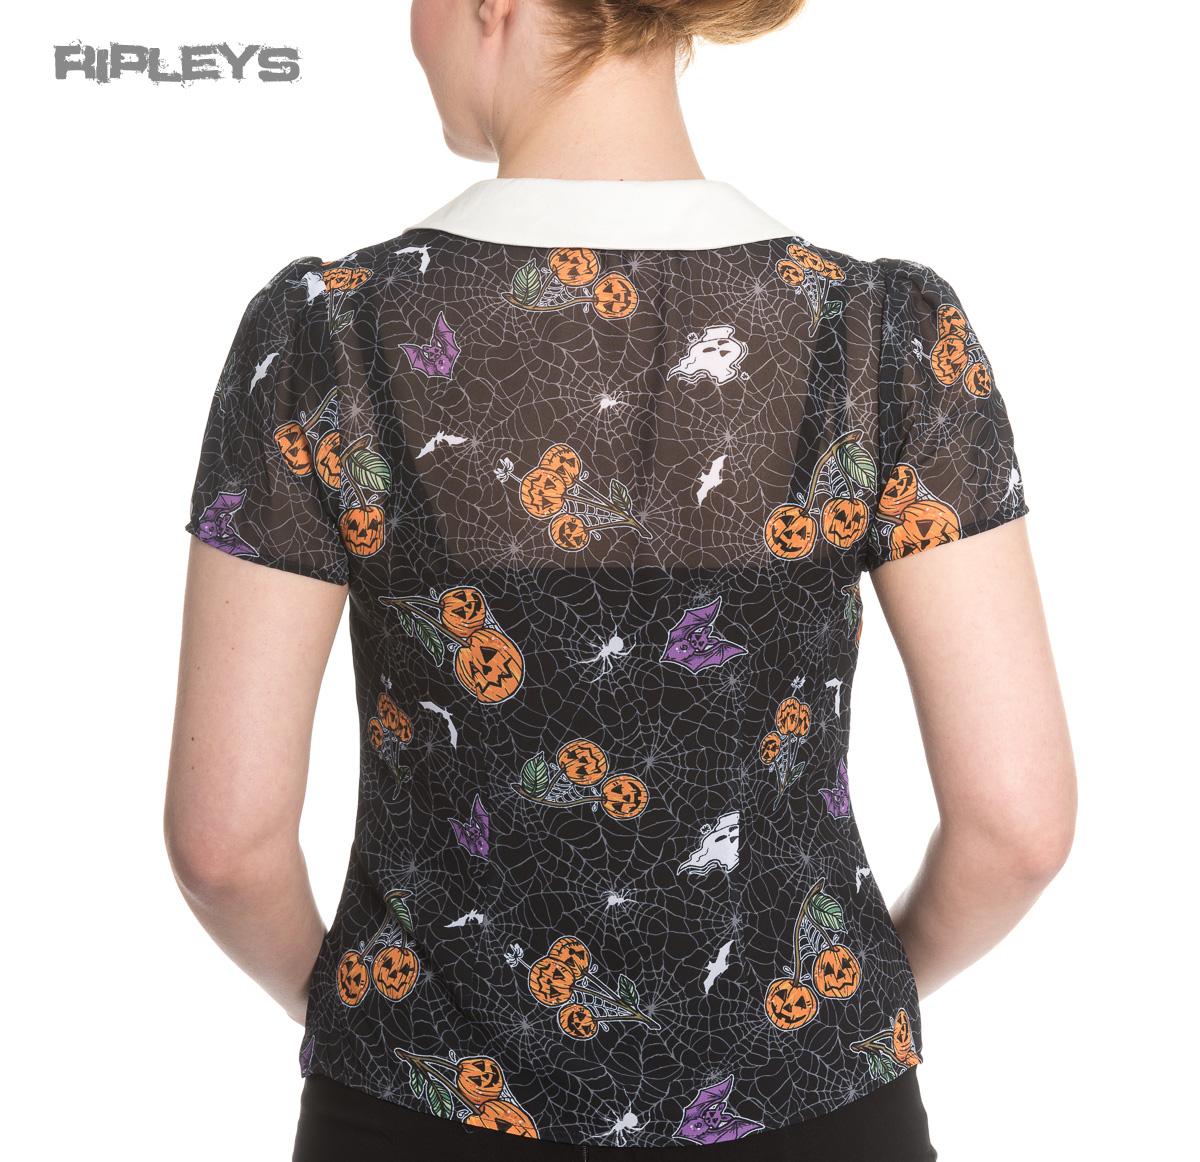 Hell-Bunny-Shirt-Top-Halloween-Webs-Pumpkins-HARLOW-Blouse-All-Sizes thumbnail 28